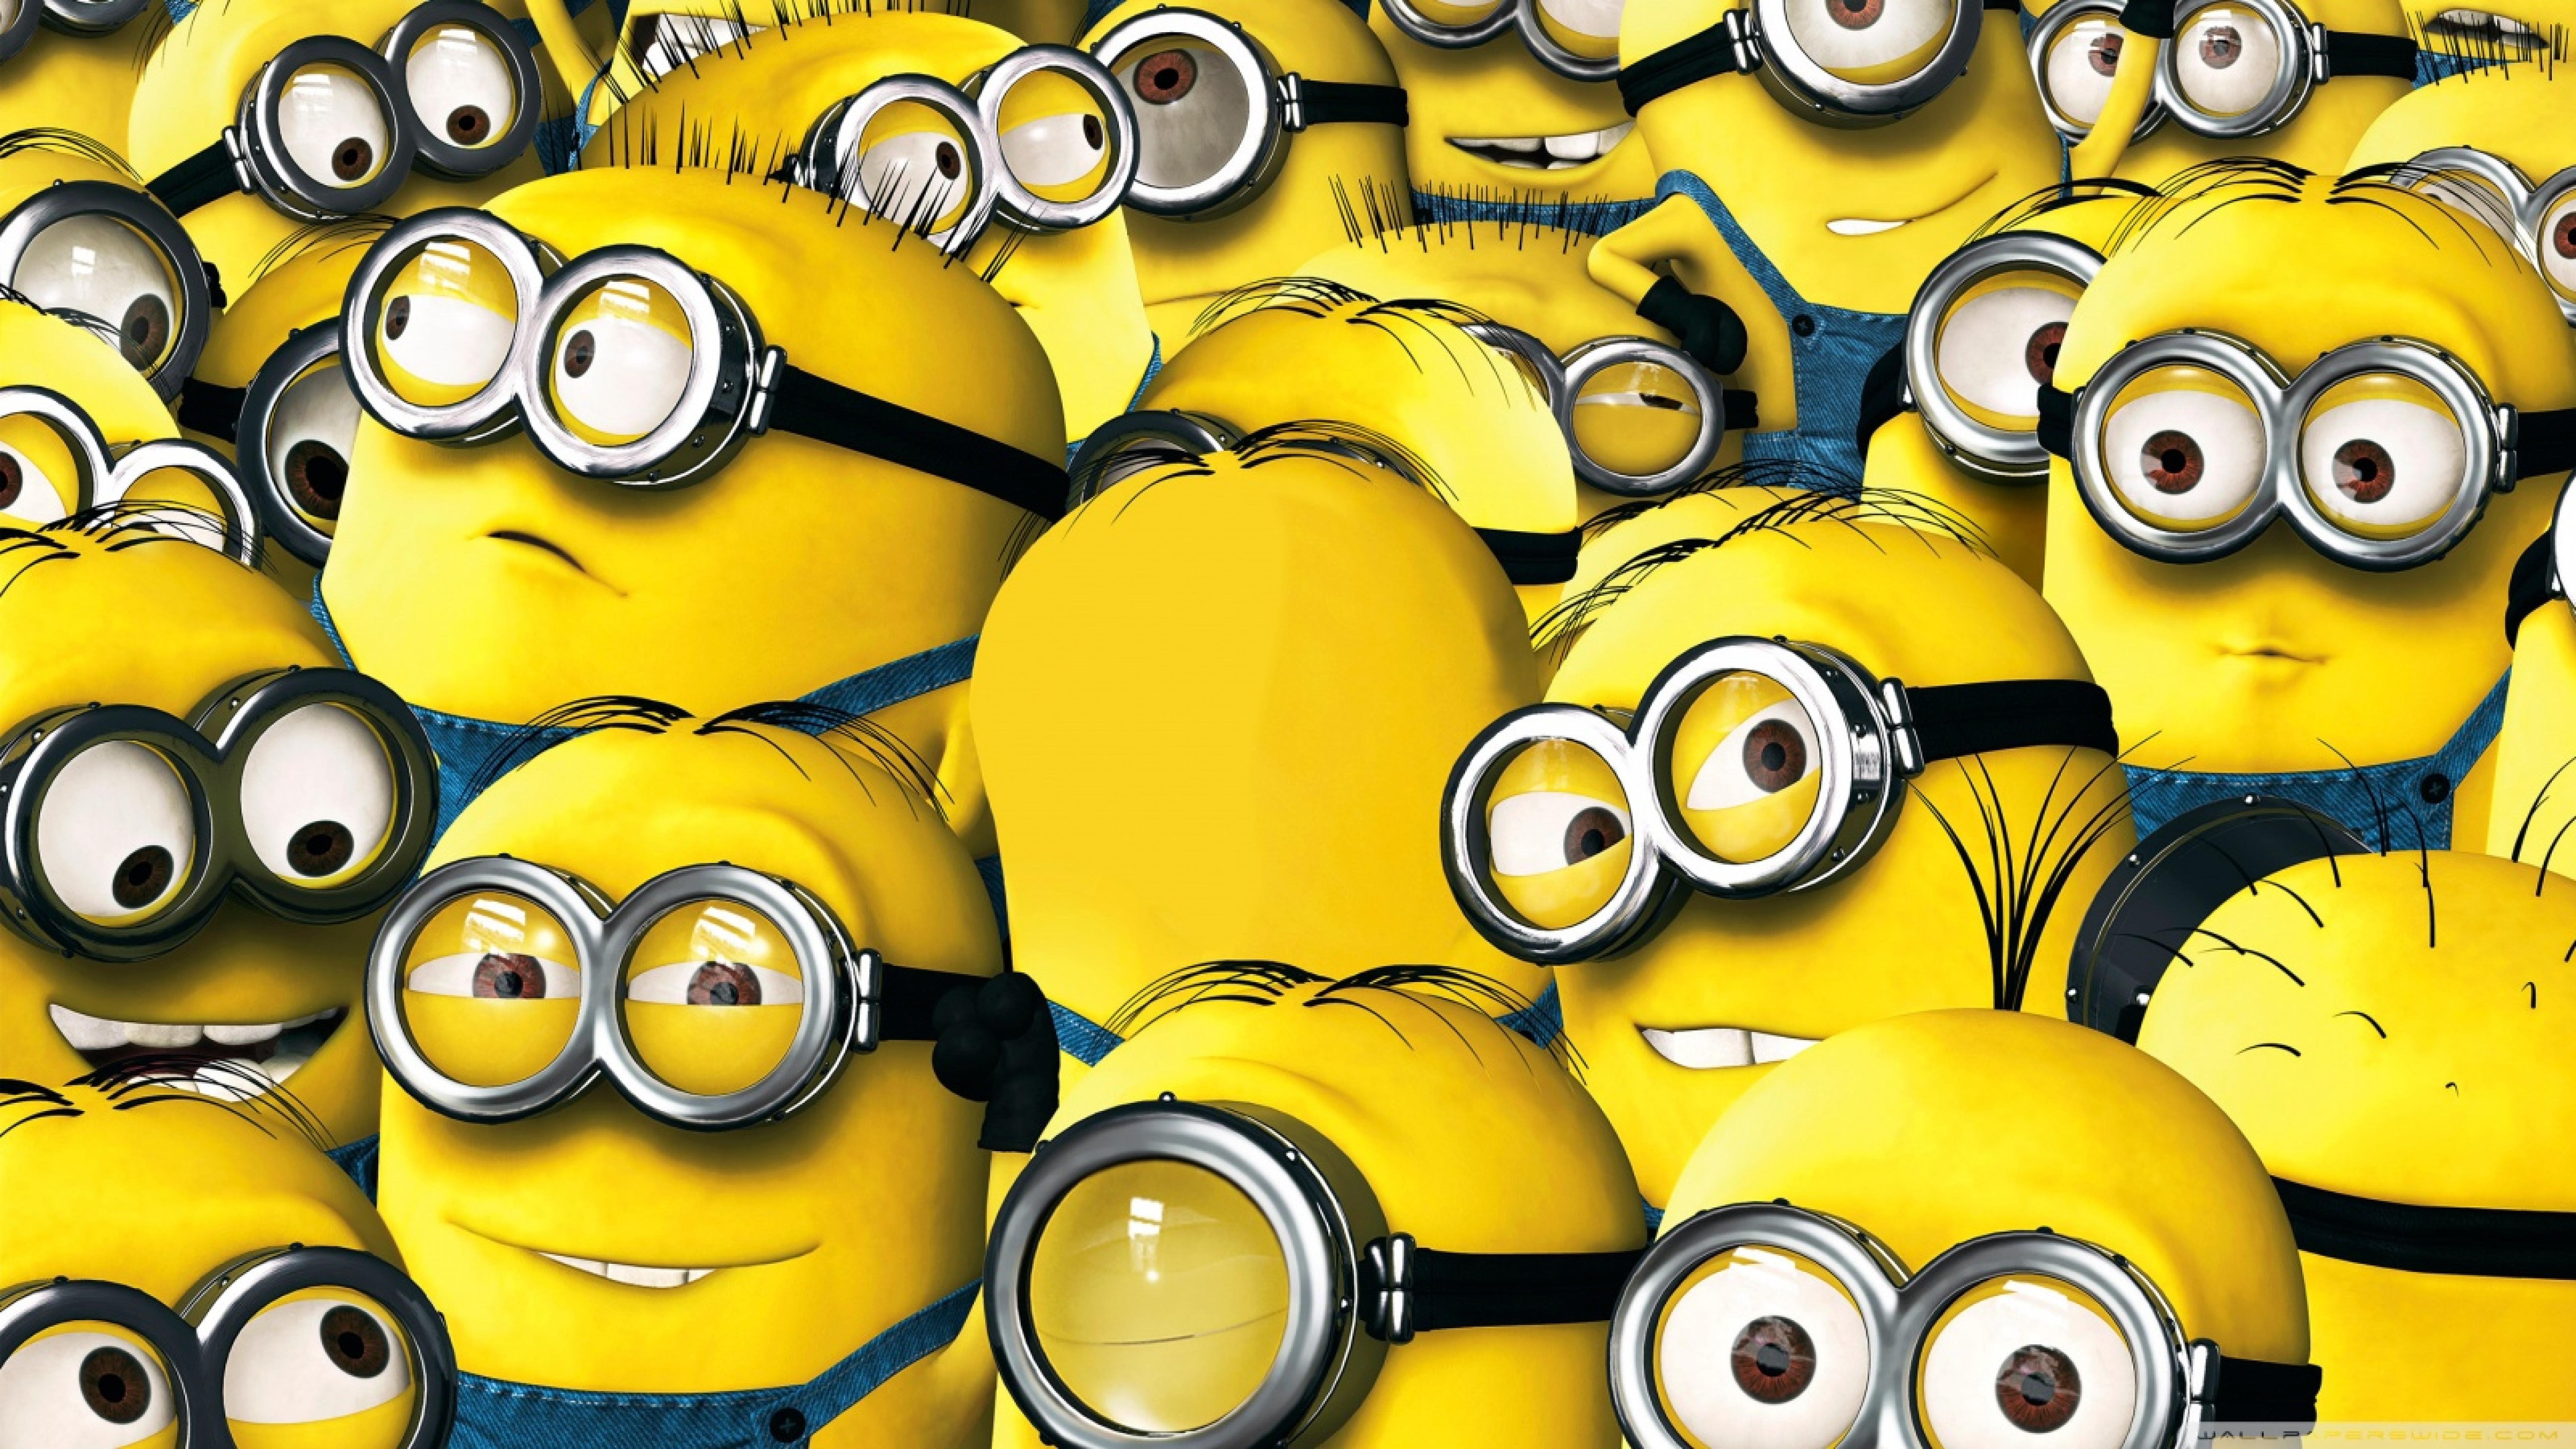 Minions 2015 Latest Photoshoot, Full HD Wallpaper